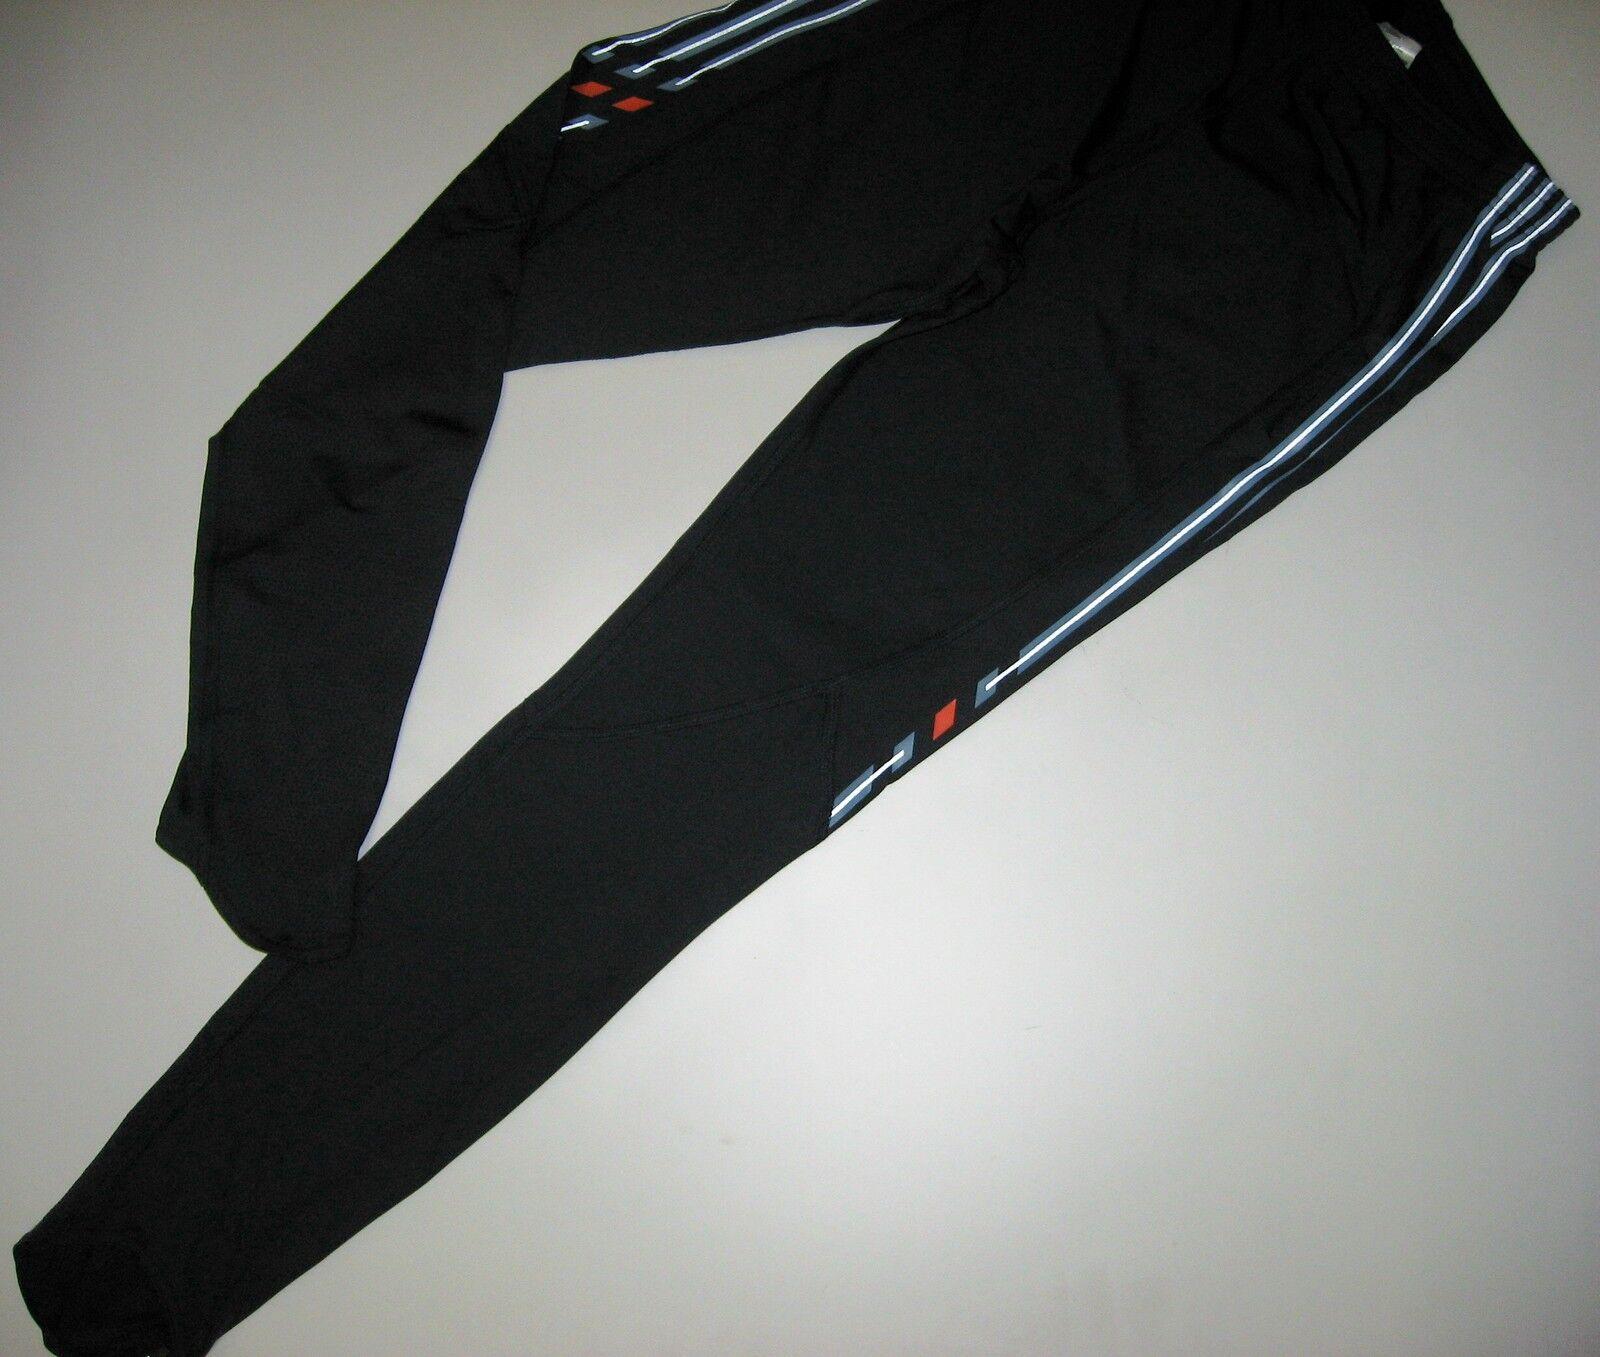 Adidas Adistar Long Tight 314628 Running Pants